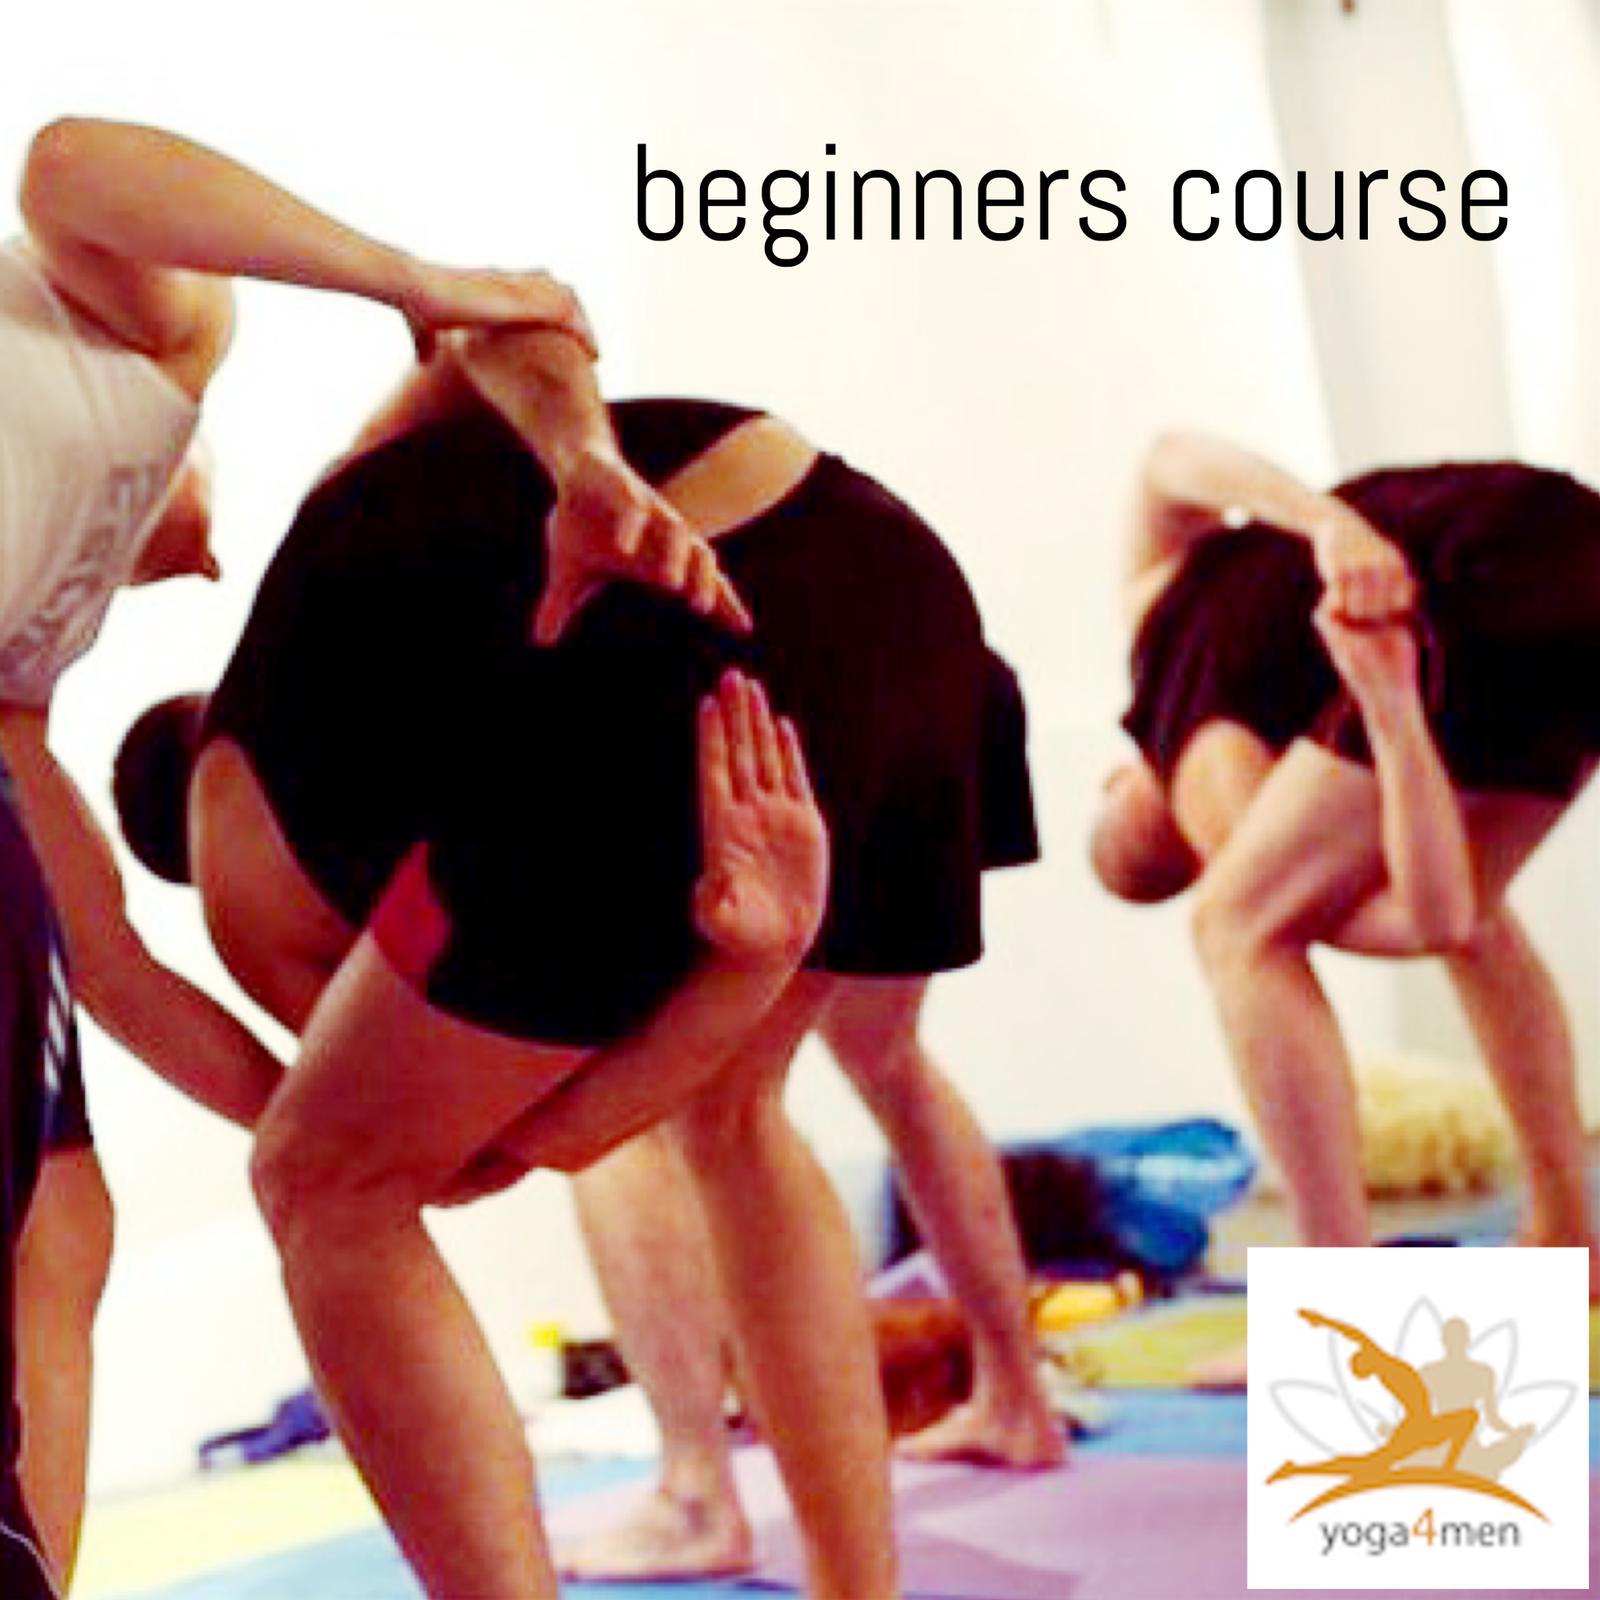 Y4M Beginners Course - Y4M